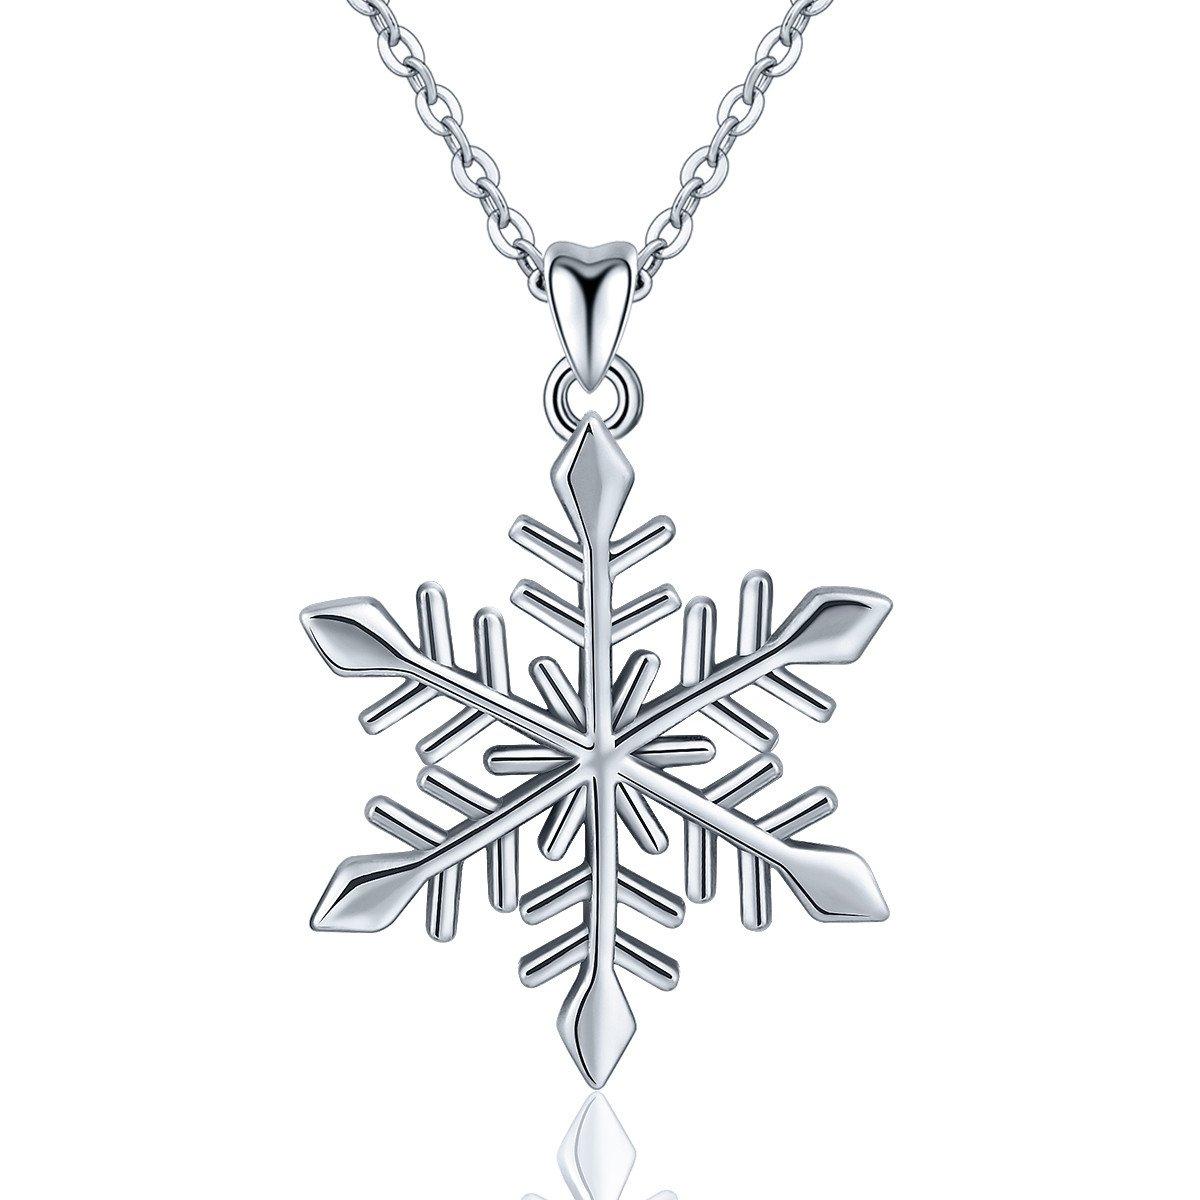 1200x1200 Eudora Sterling Silver Snowflake Pendant Necklace